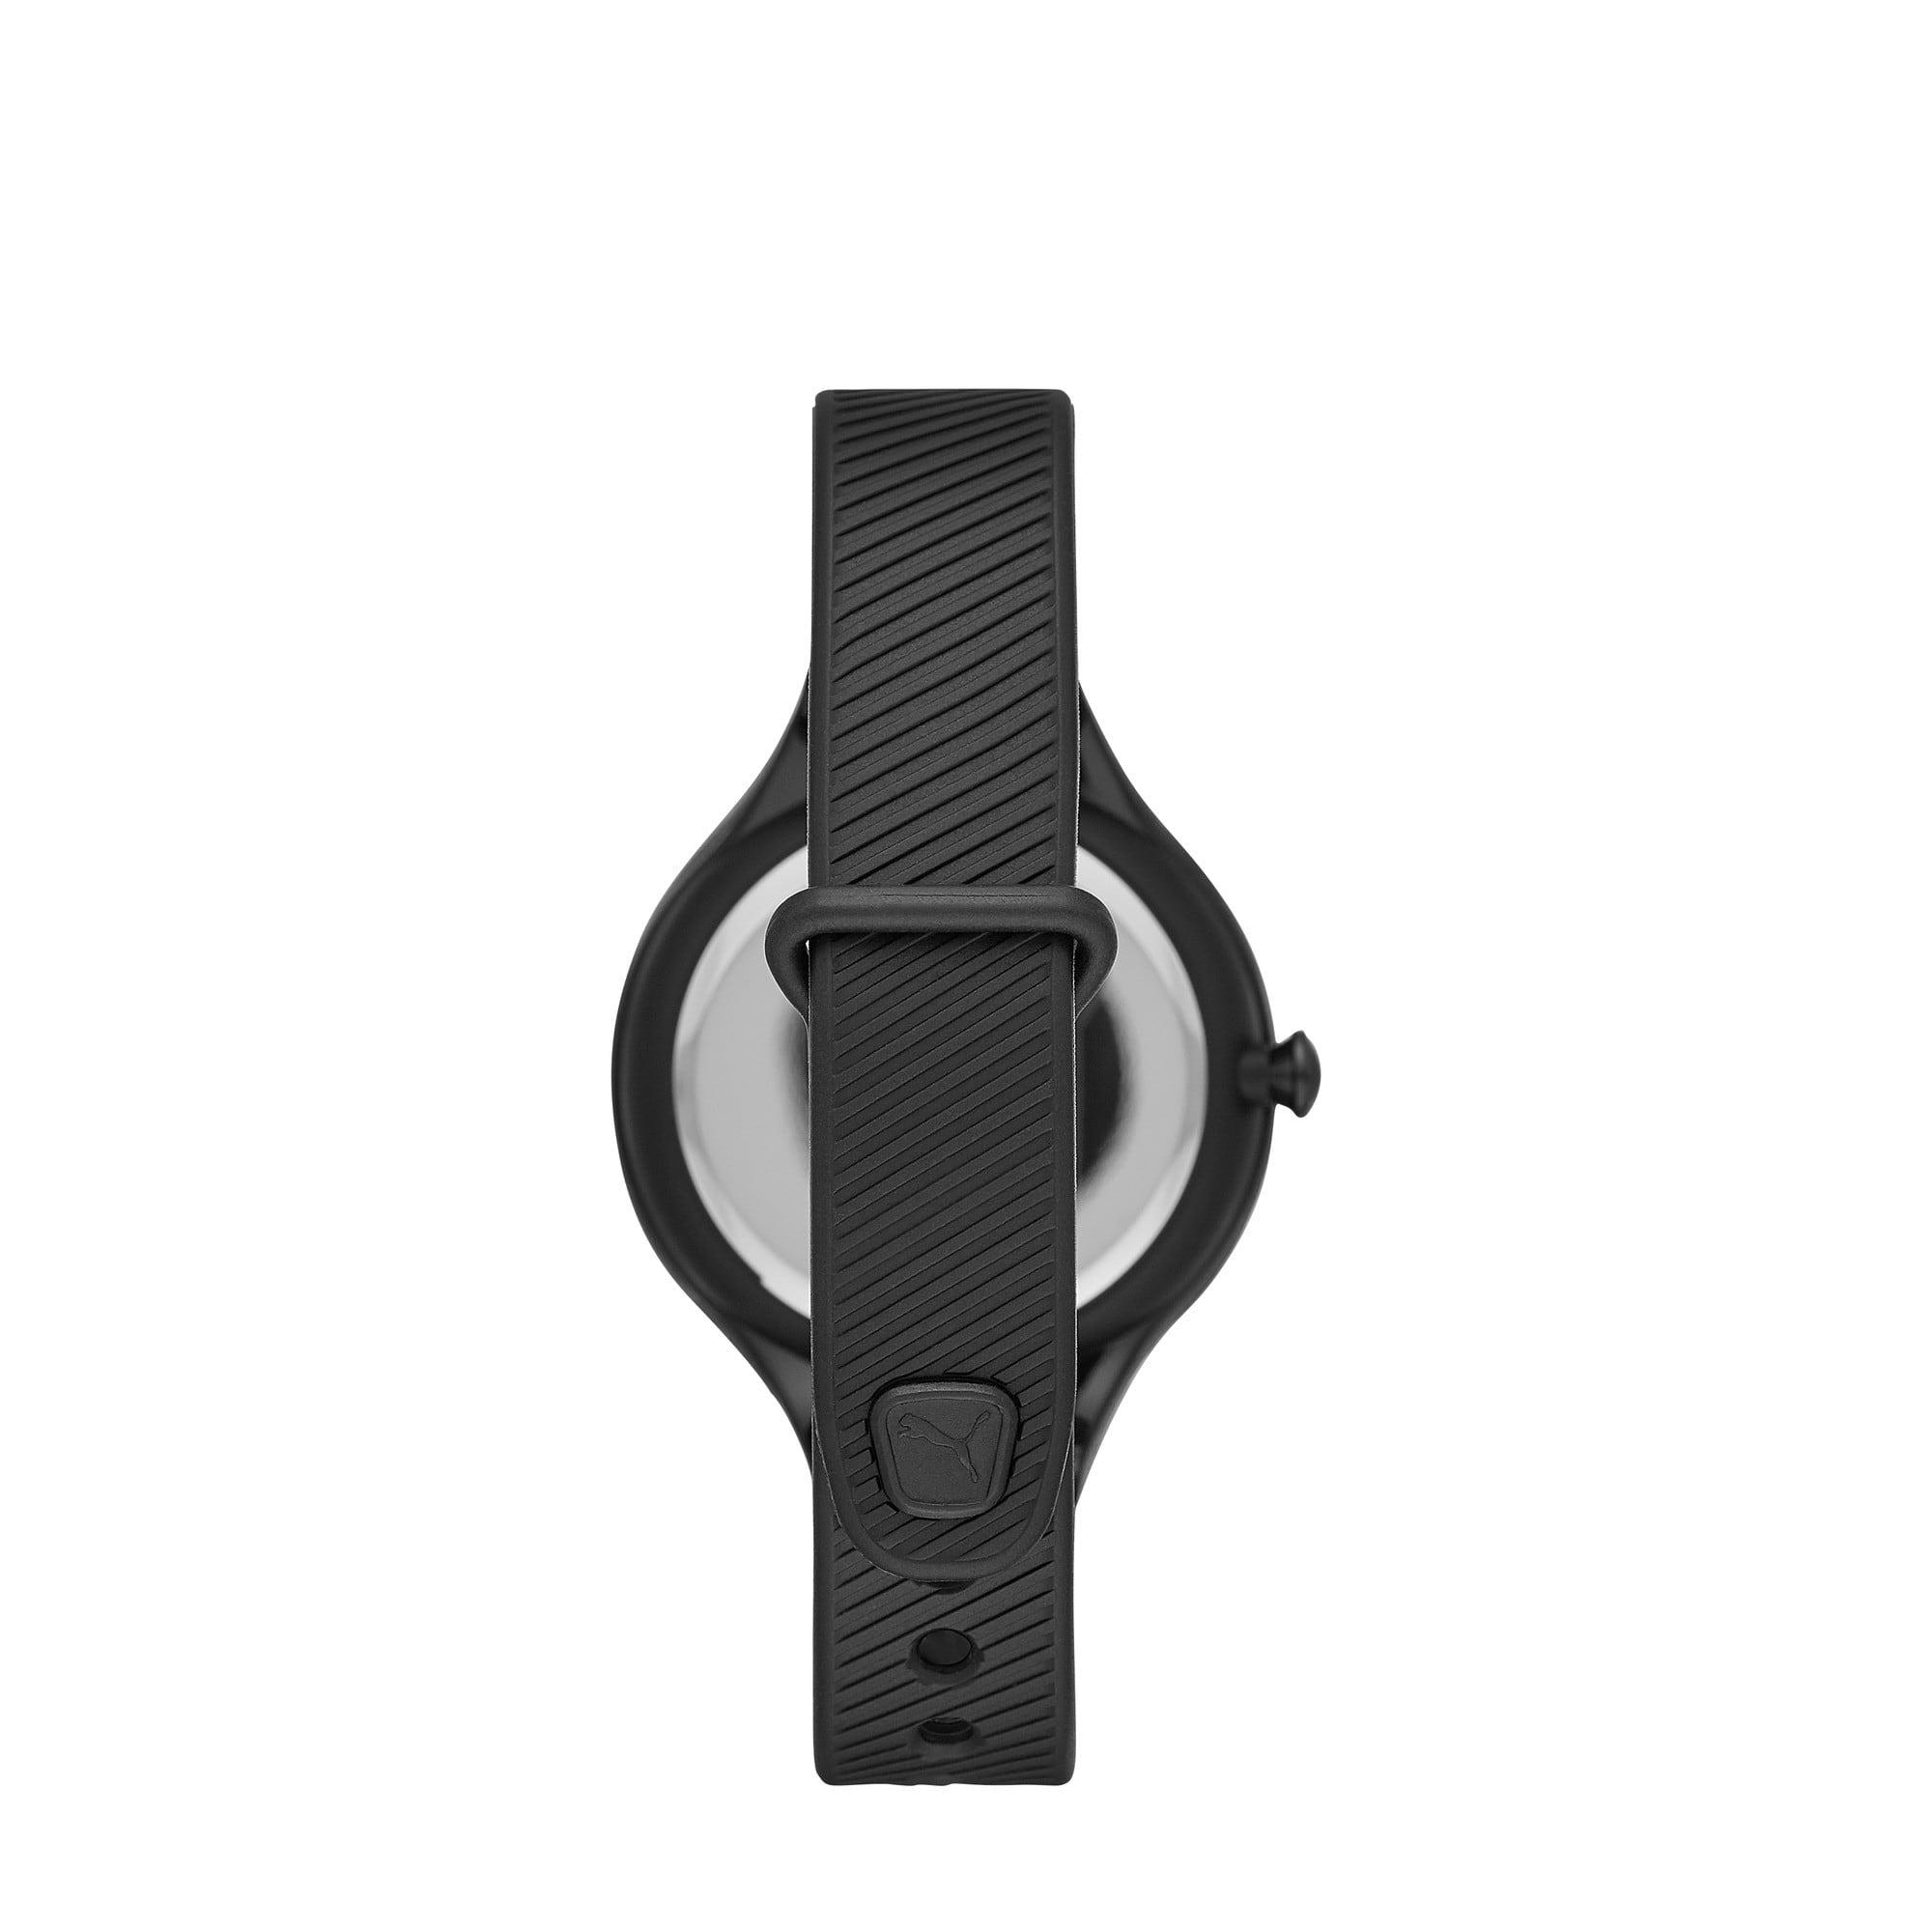 Thumbnail 2 of CONTOUR Ultra-Slim Damen Uhr, Black/Black, medium